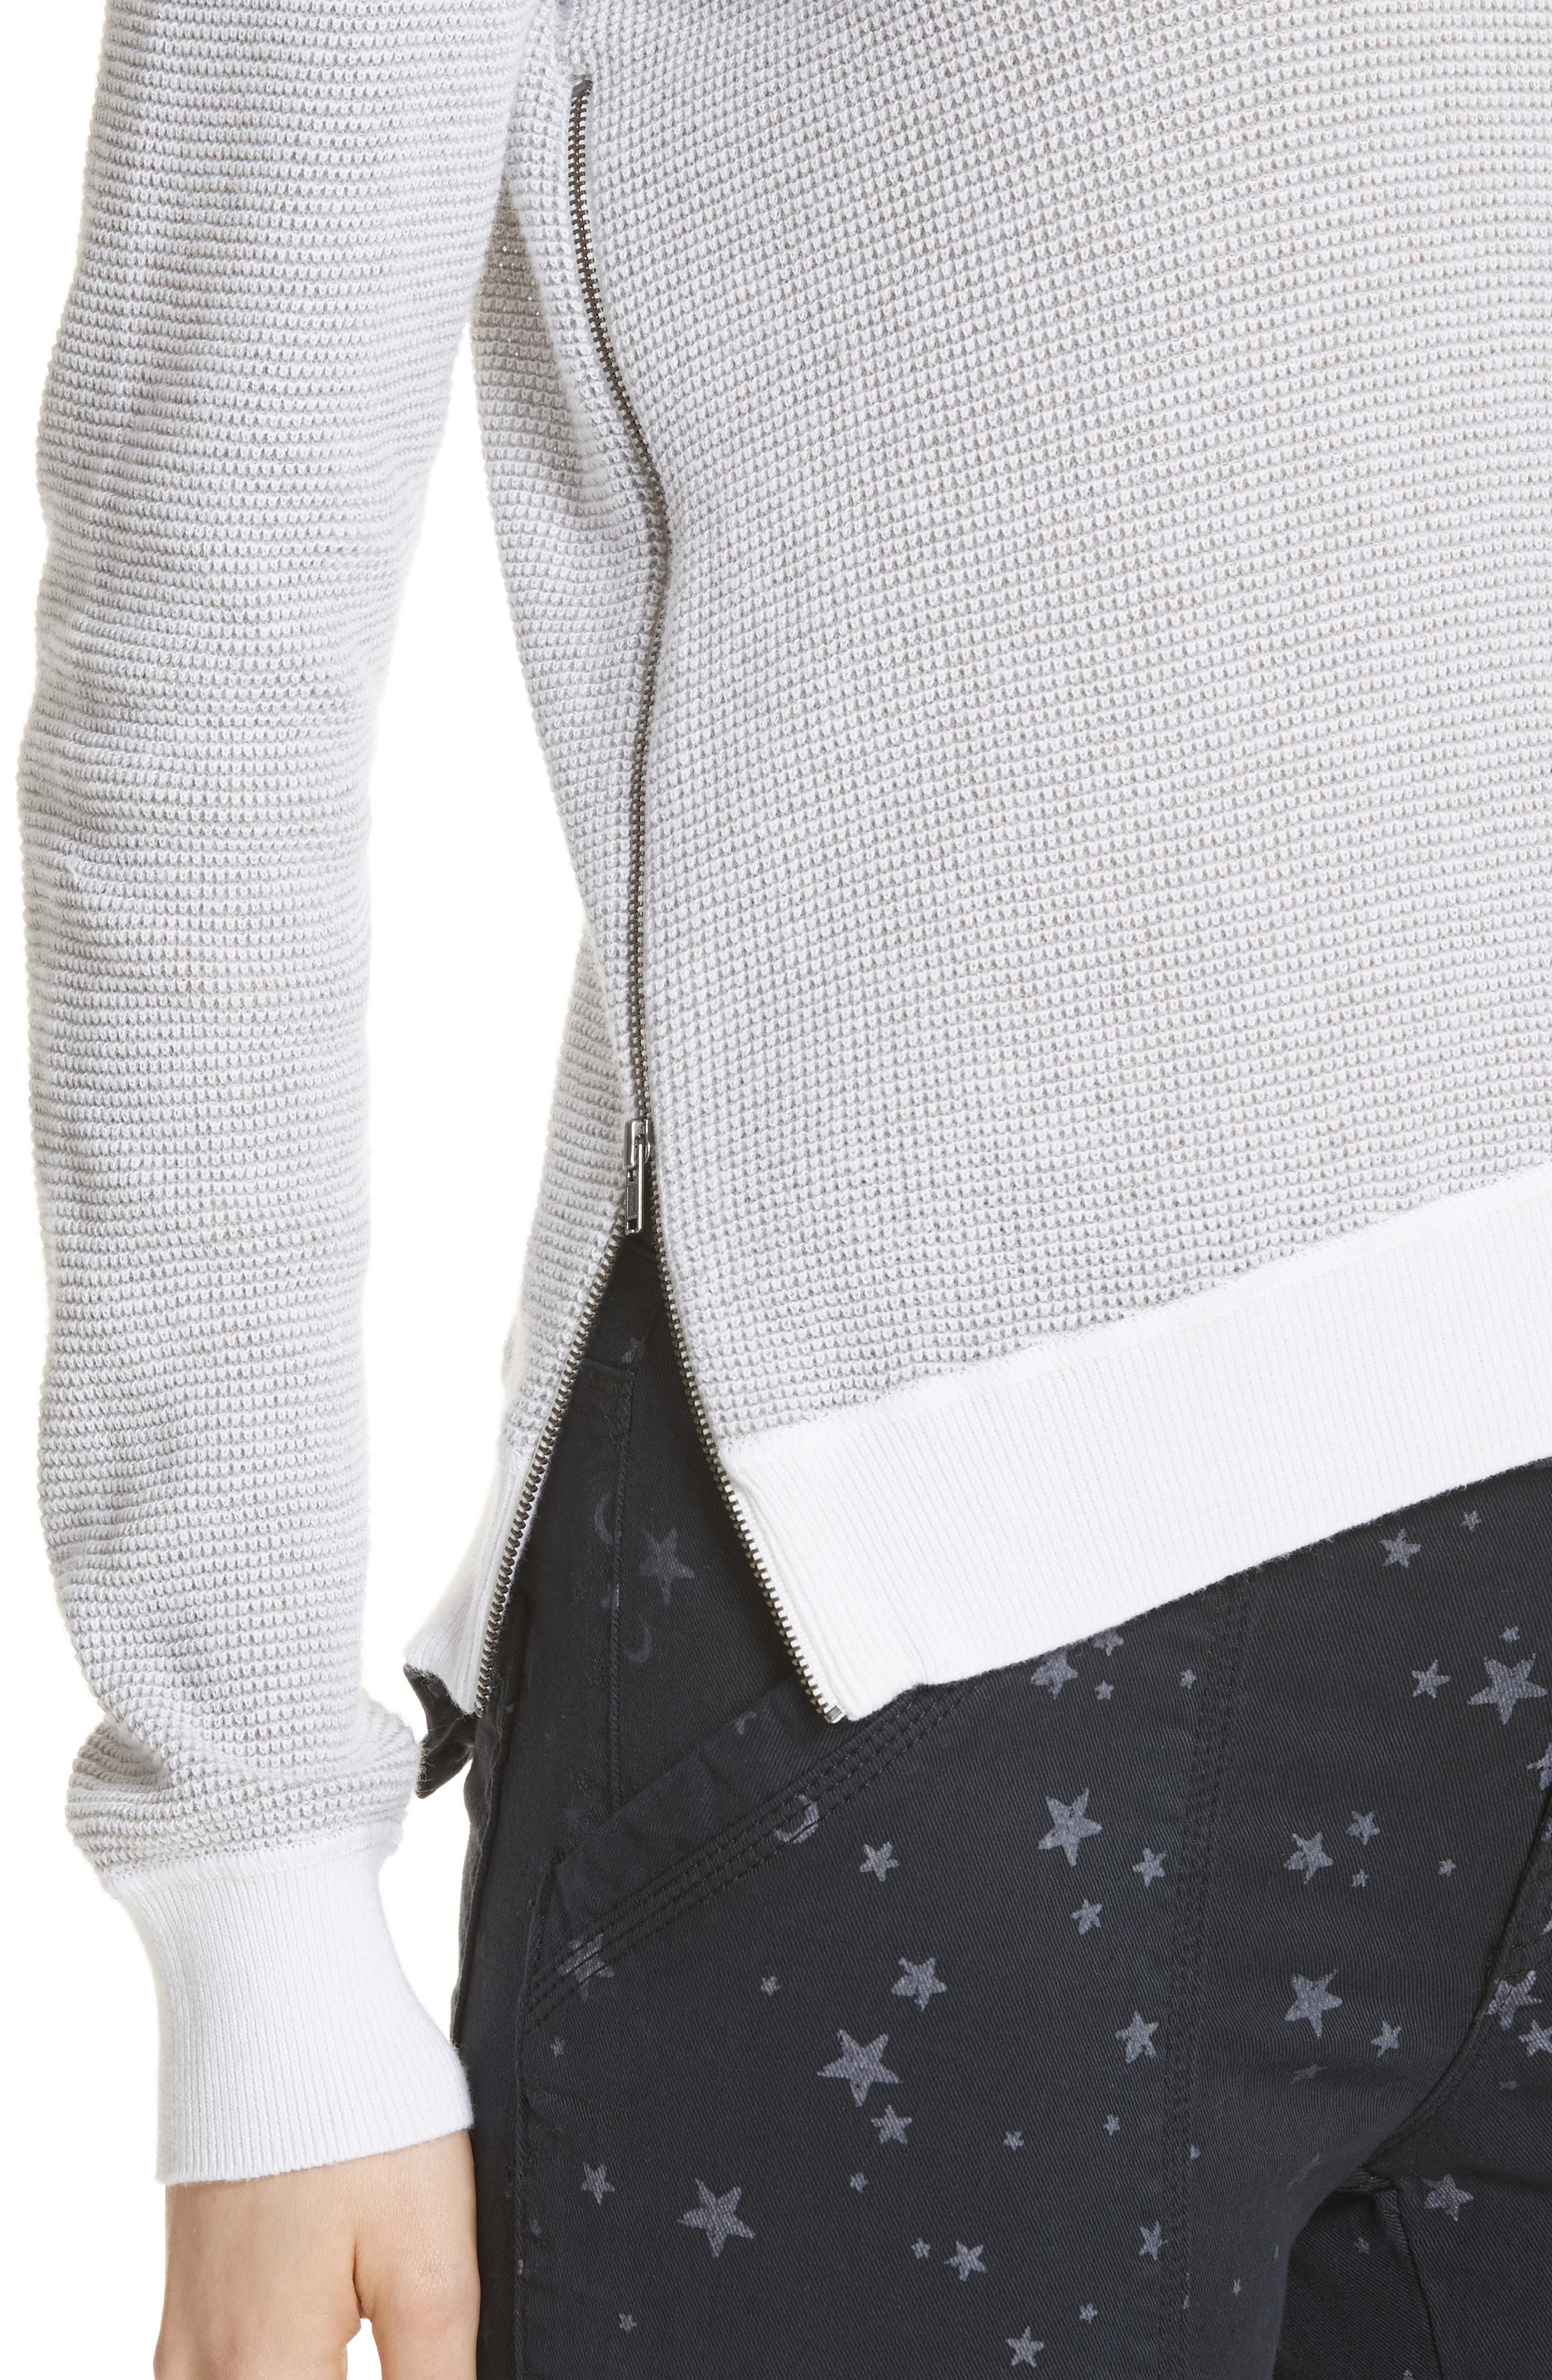 Laurana Cotton & Cashmere Sweater,                             Alternate thumbnail 4, color,                             Porcelain/ Heather Grey